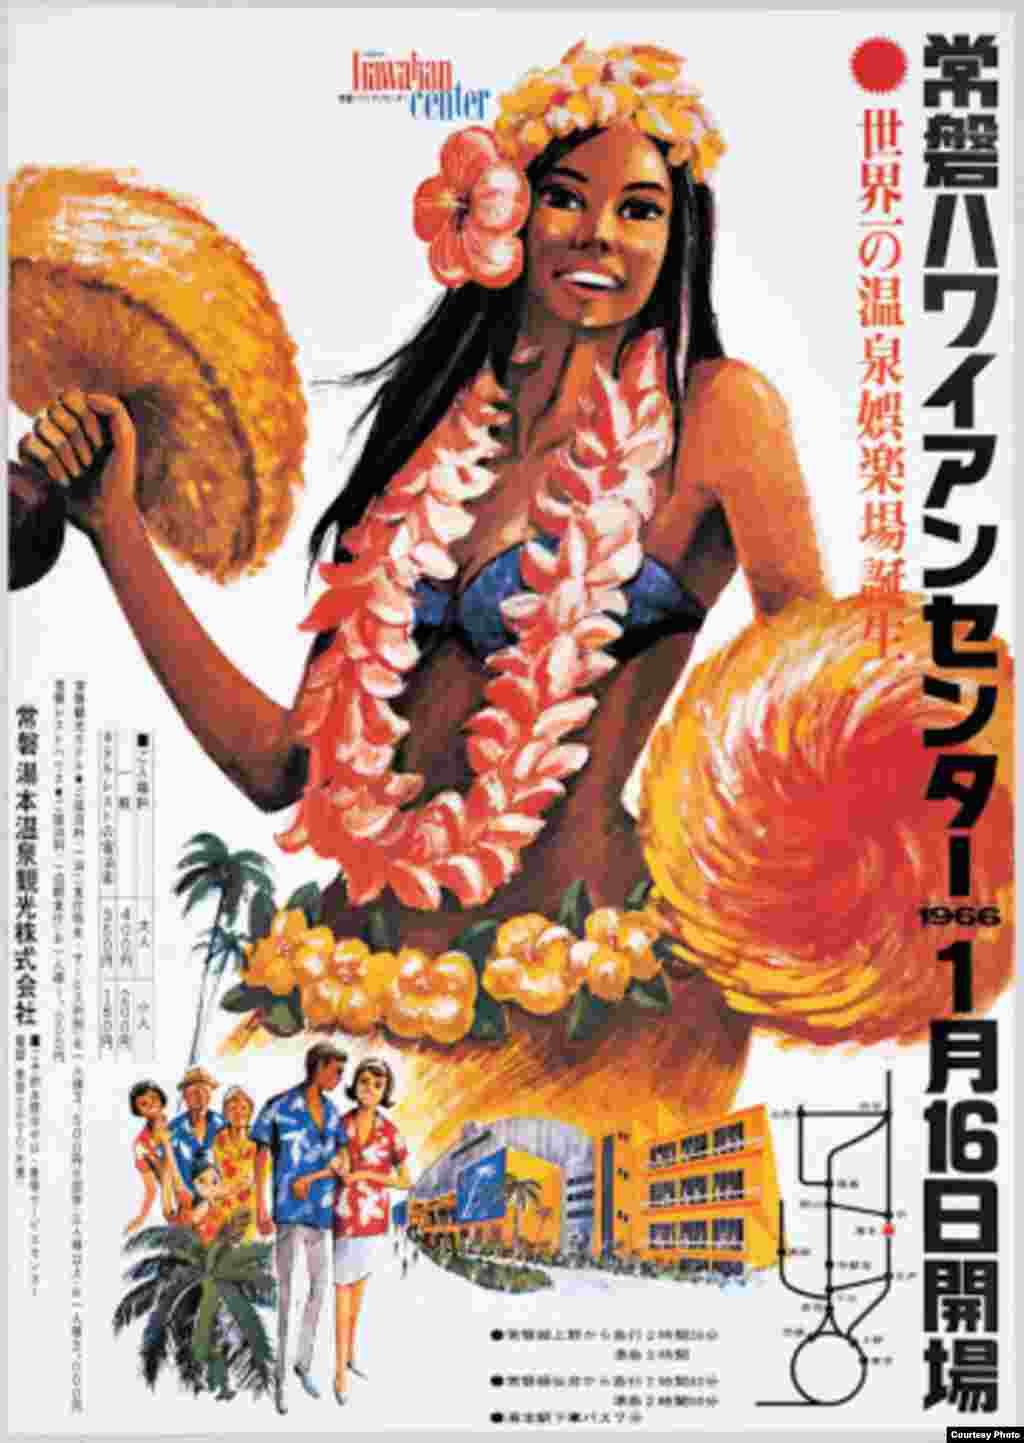 Japan's first theme park opened in Iwaki in Jan. 1966, (Courtesy, Joban Kosan Co.)